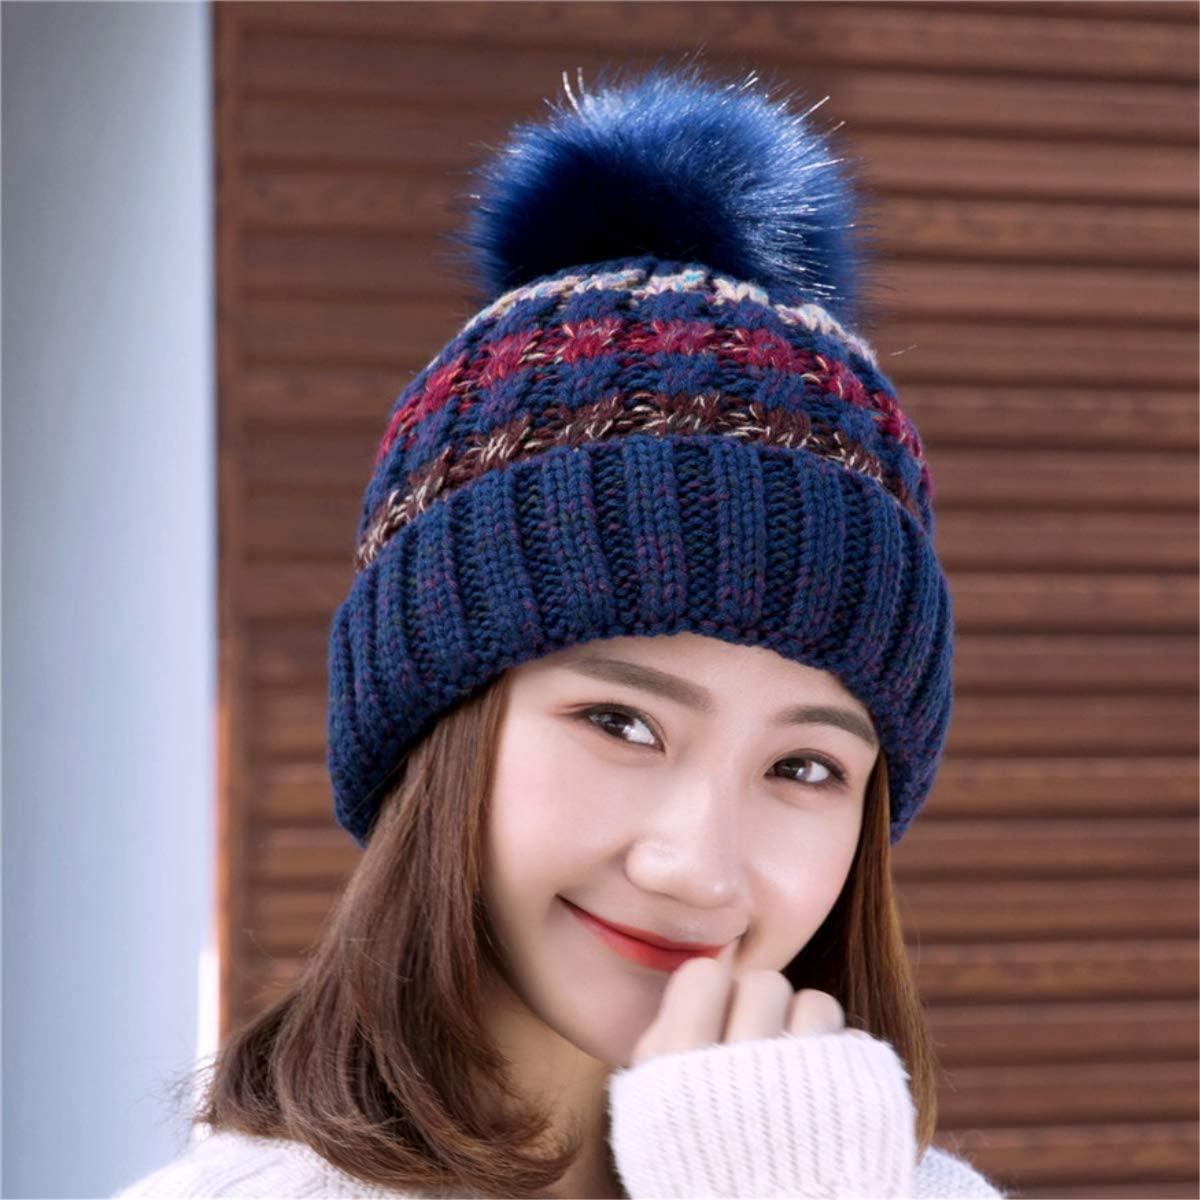 IMIKE Women's Thick Knit Beanie Hat Winter Fleece Lined Warm Soft Stretch Slouchy Cable Pom Pom Beanie Hat Skull Cap Ski Cap